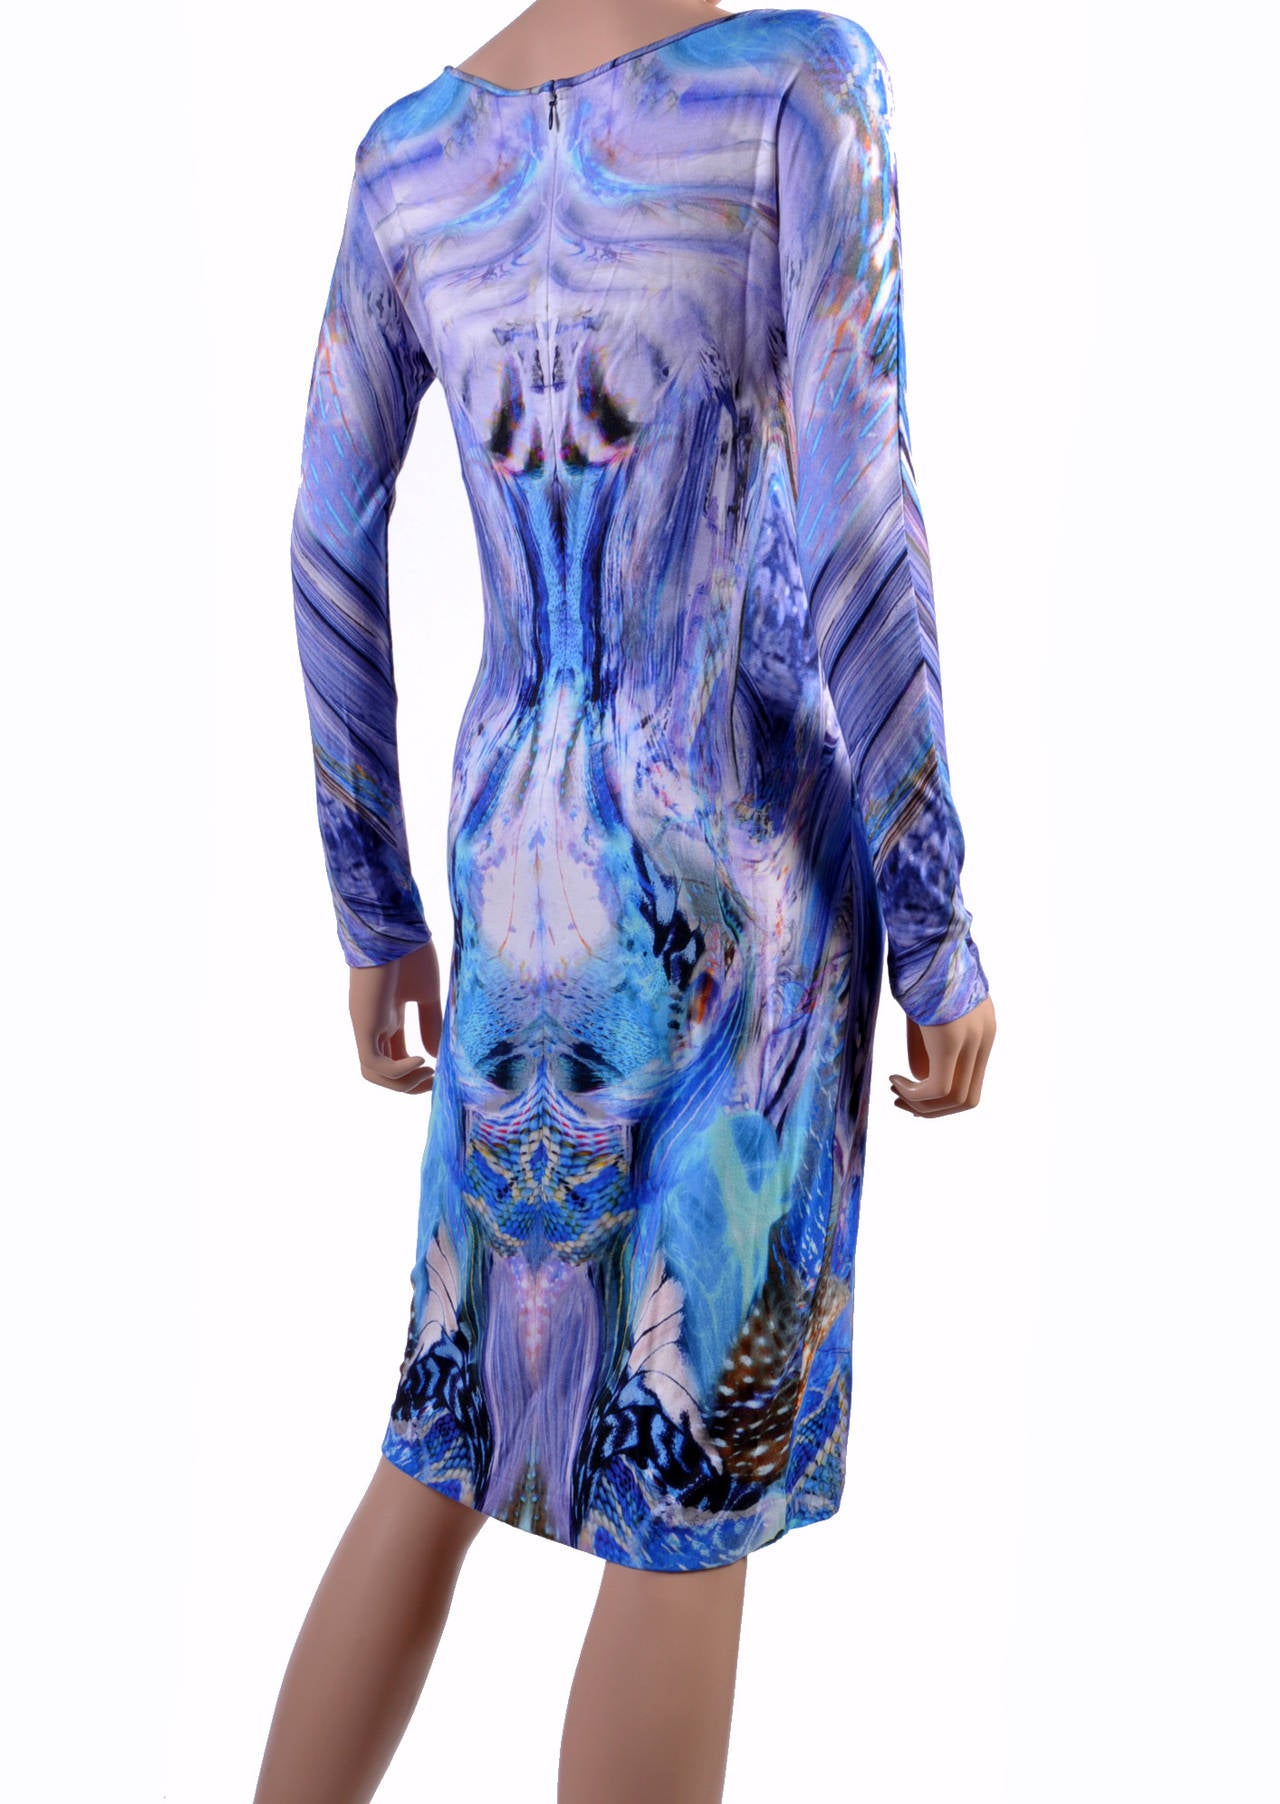 Purple Alexander Mcqueen 2010 Plato Atlantis Dress For Sale